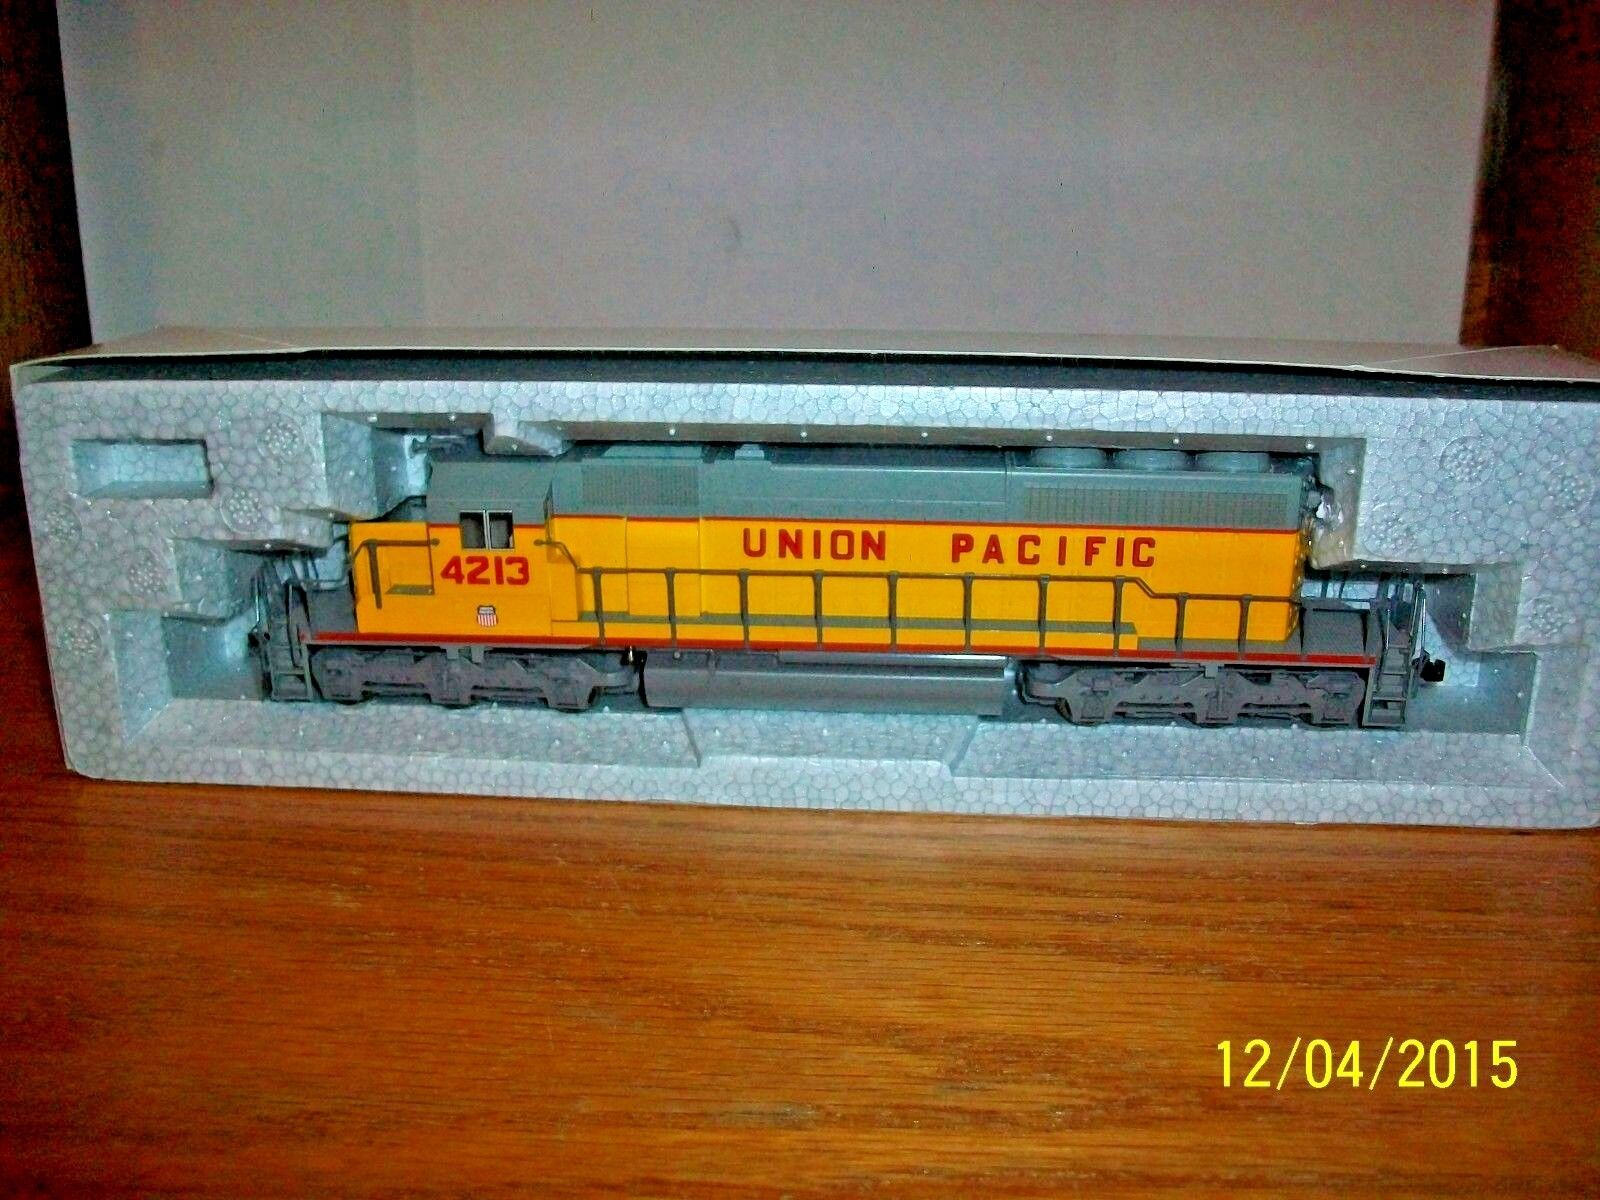 Kato bellofram escala EMD SD 40-2 Diesel Locomotora de Union Pacific   4213